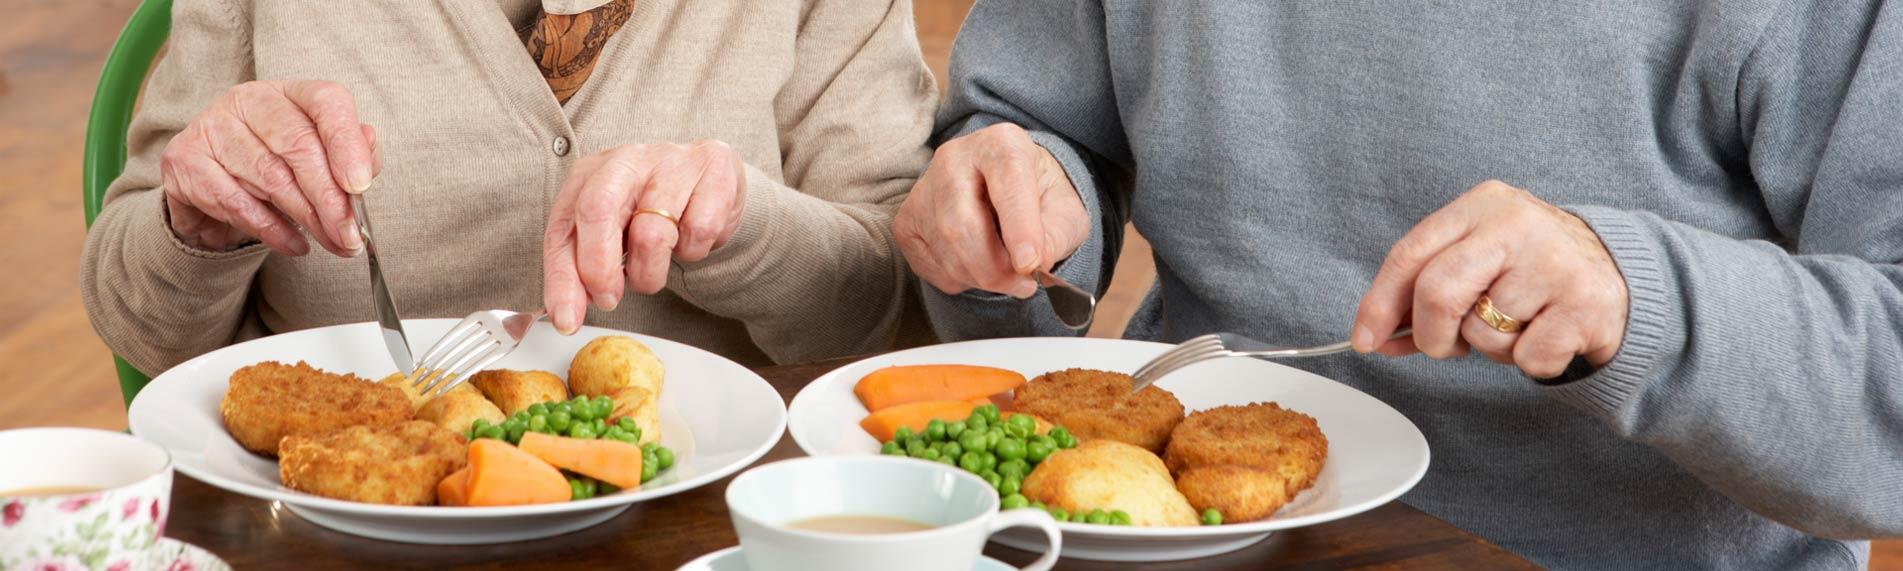 Excelcare-Wellbeing-Mealtimes-Header.jpg